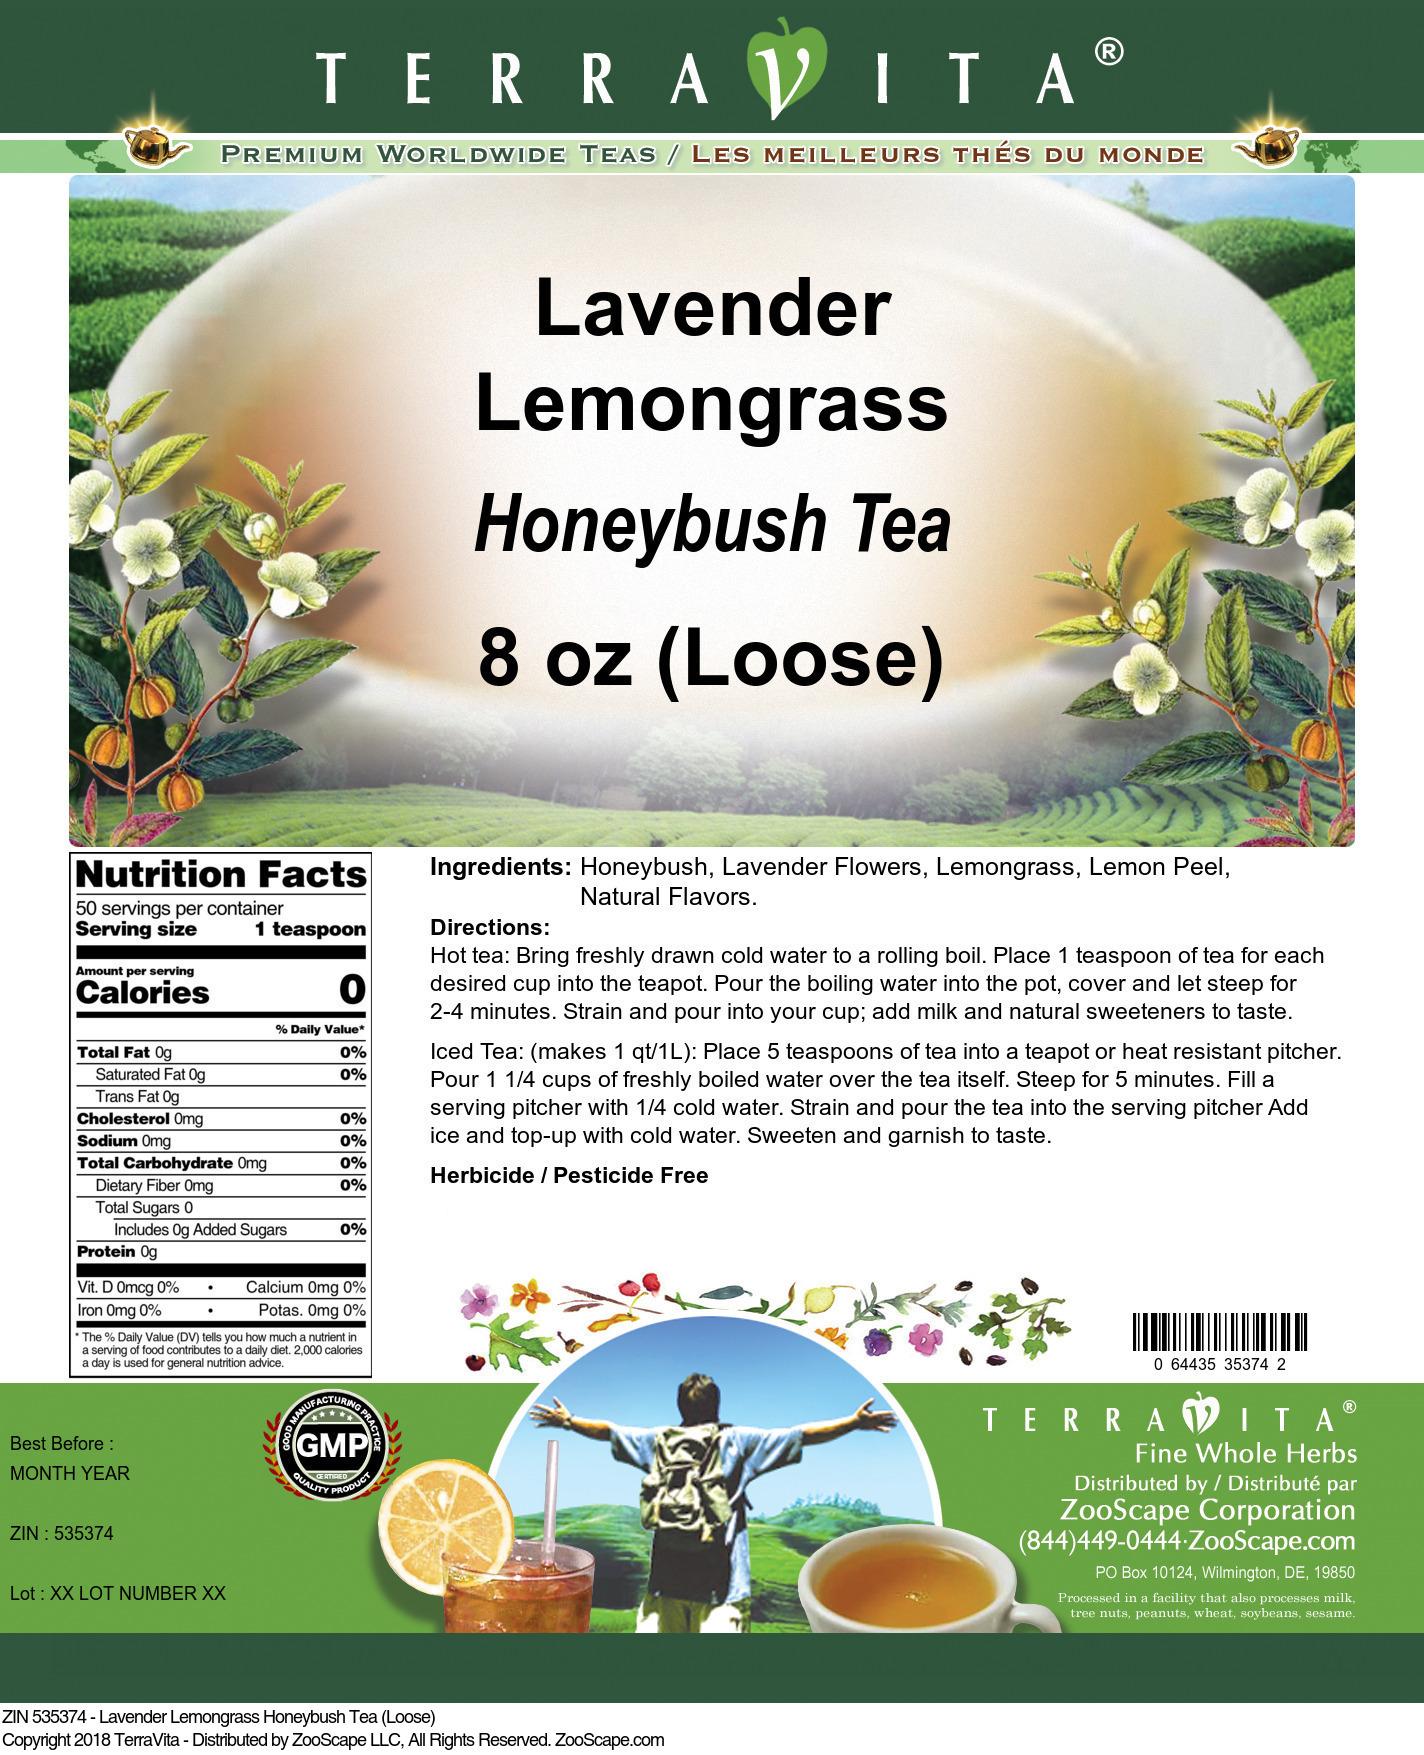 Lavender Lemongrass Honeybush Tea (Loose)